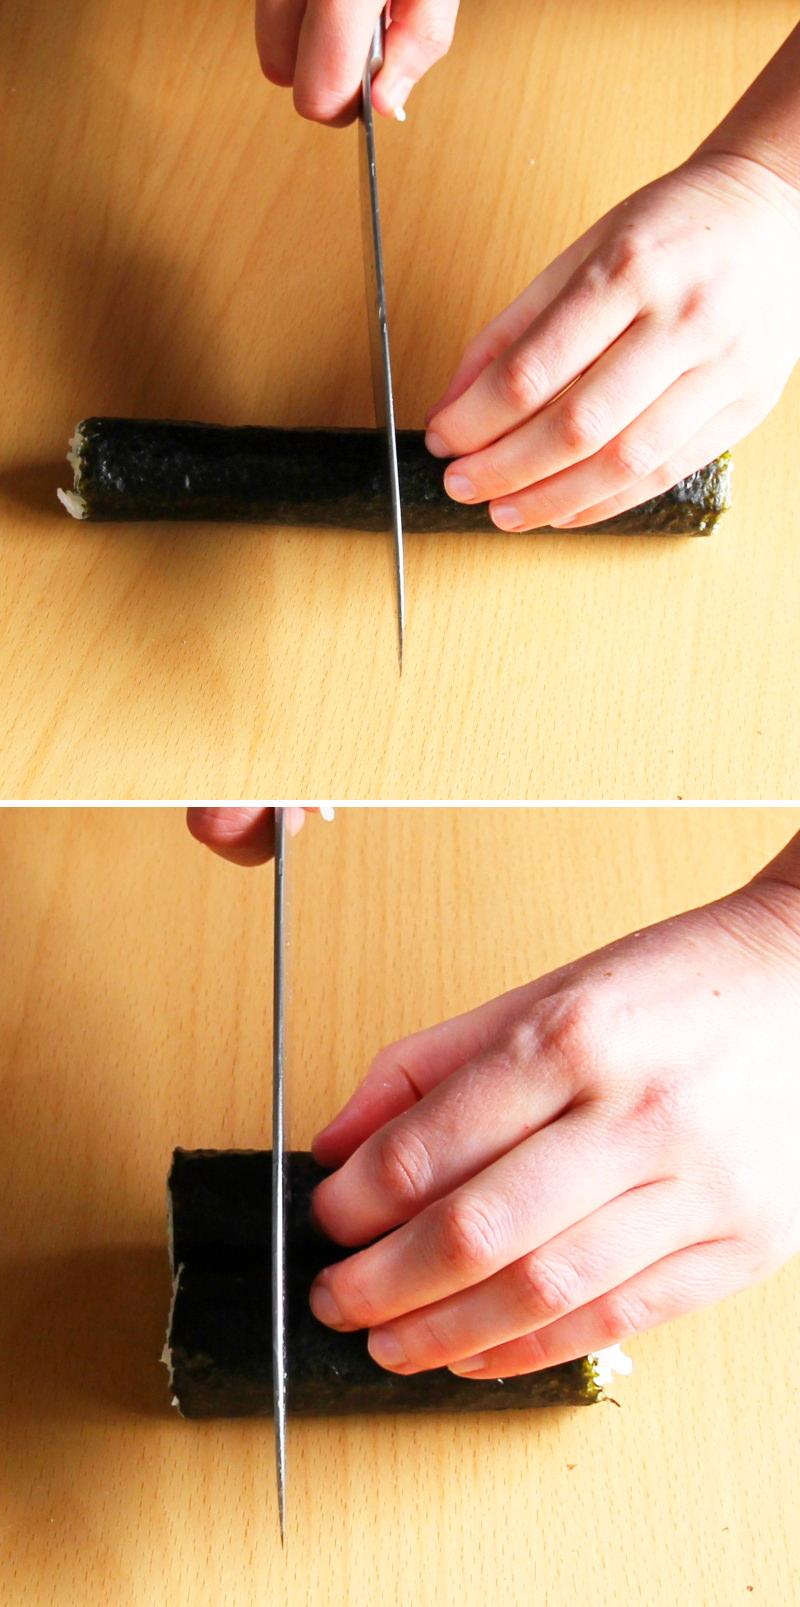 Hosomaki Schritt 11 Sushi schneiden